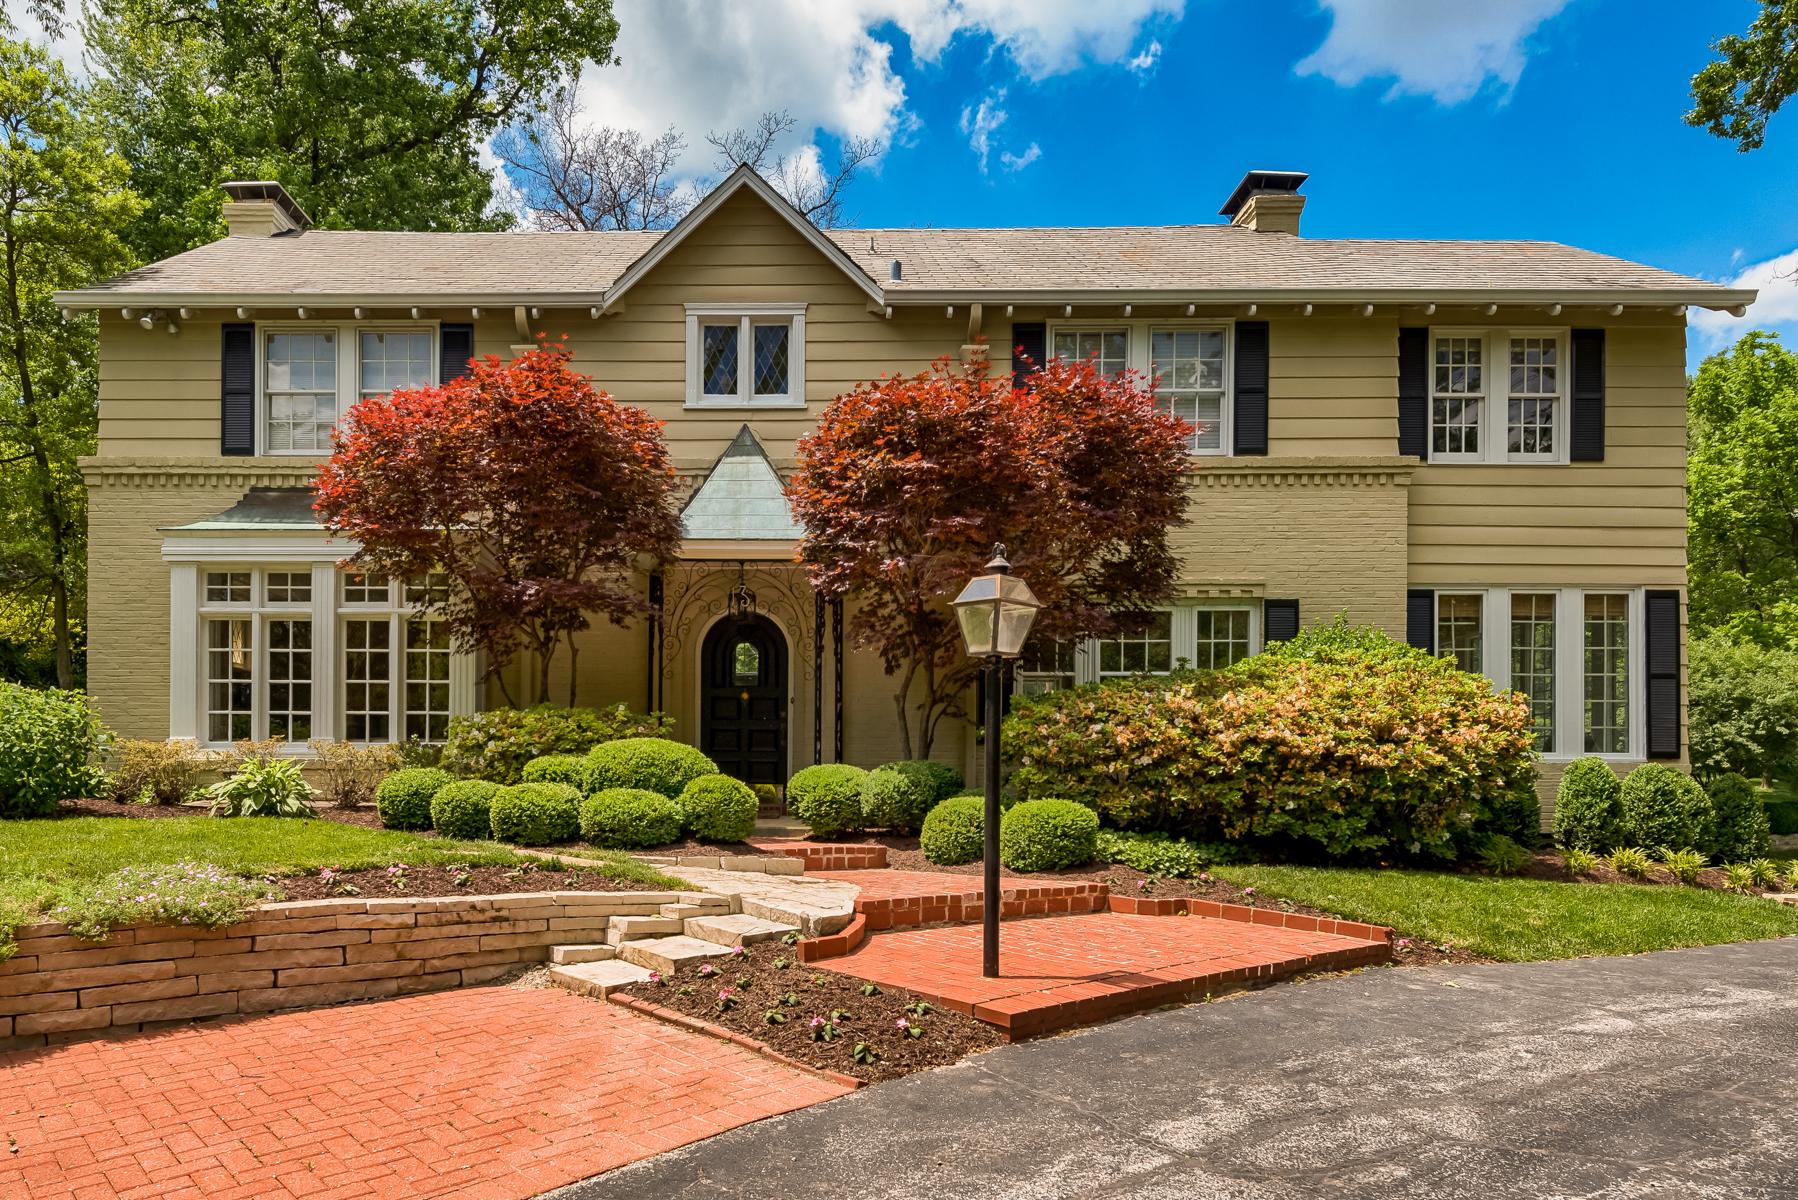 Single Family Home for Sale at Oakleigh Lane 13 Oakleigh Lane Ladue, Missouri, 63124 United States